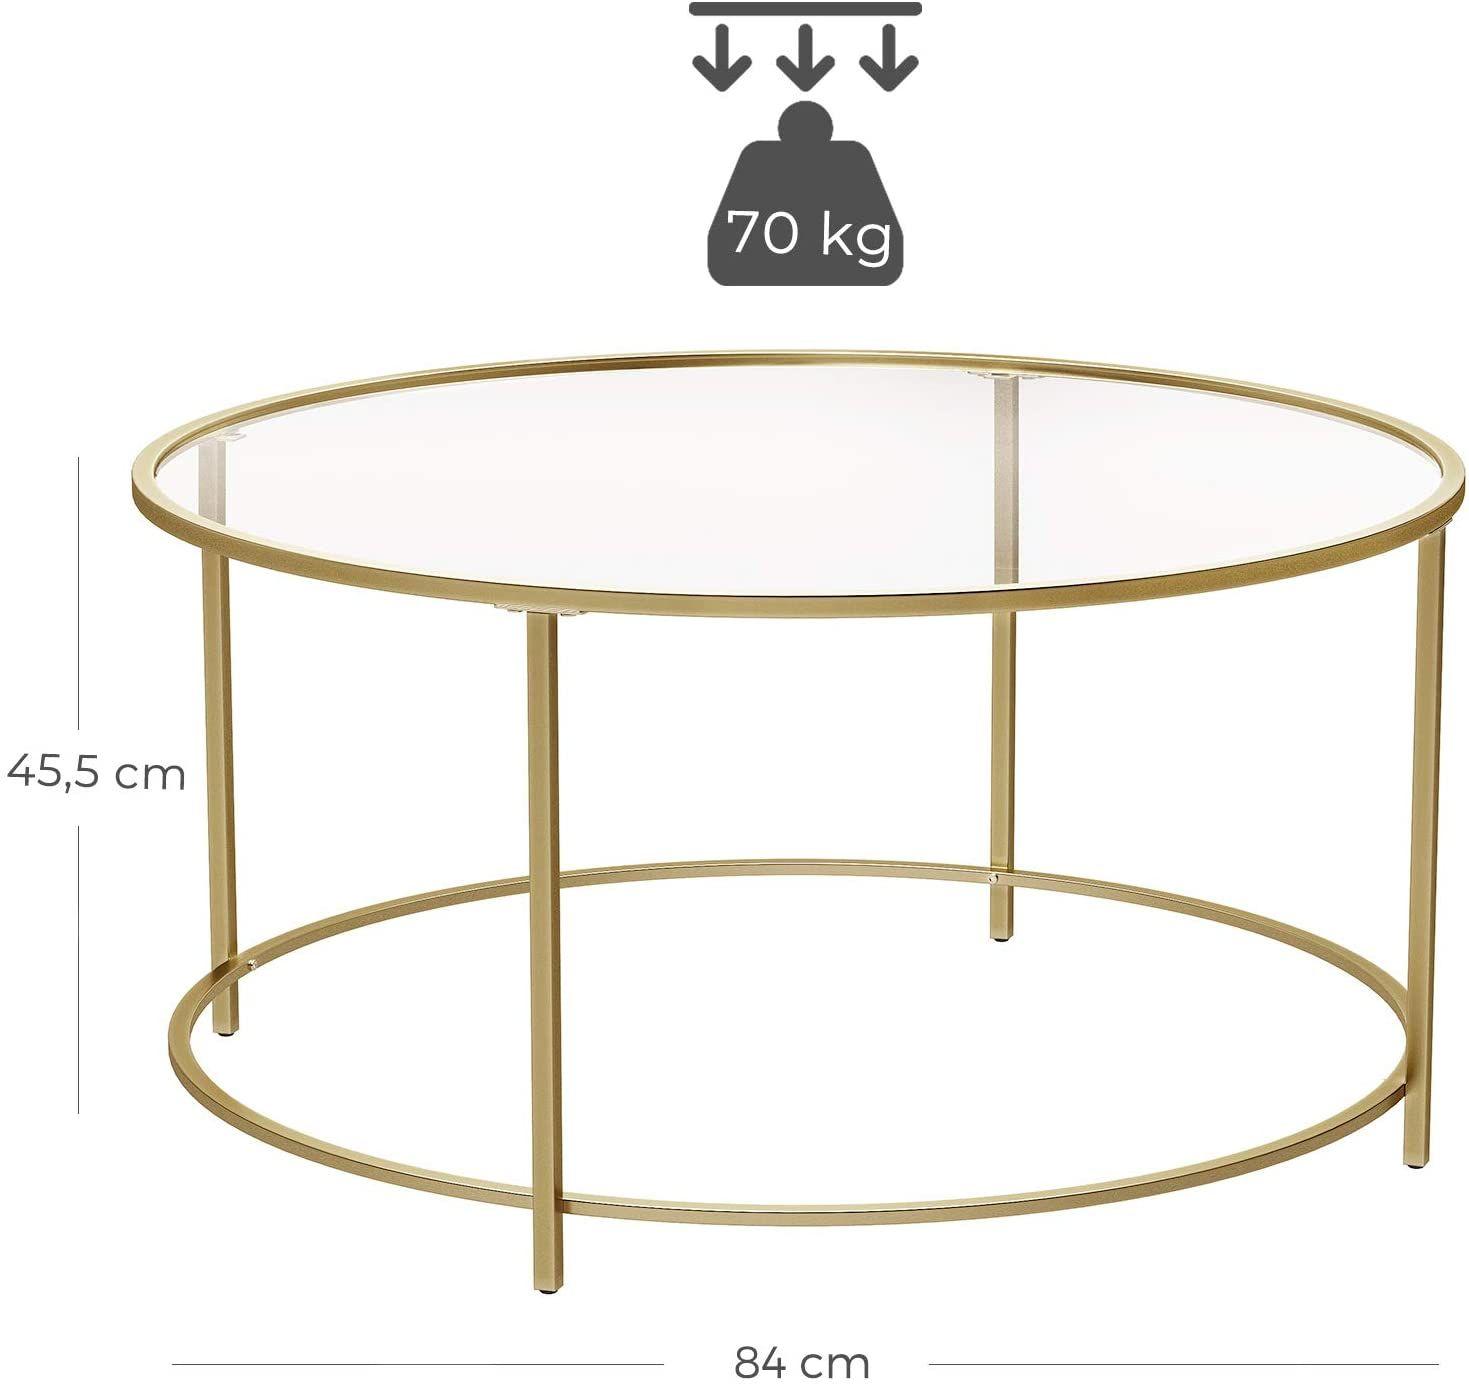 Vasagle Table Basse Ronde Plateau En Verre Trempe Armature Metallique Doree Table De Salon Bout In 2020 At Home Store Table Design Table